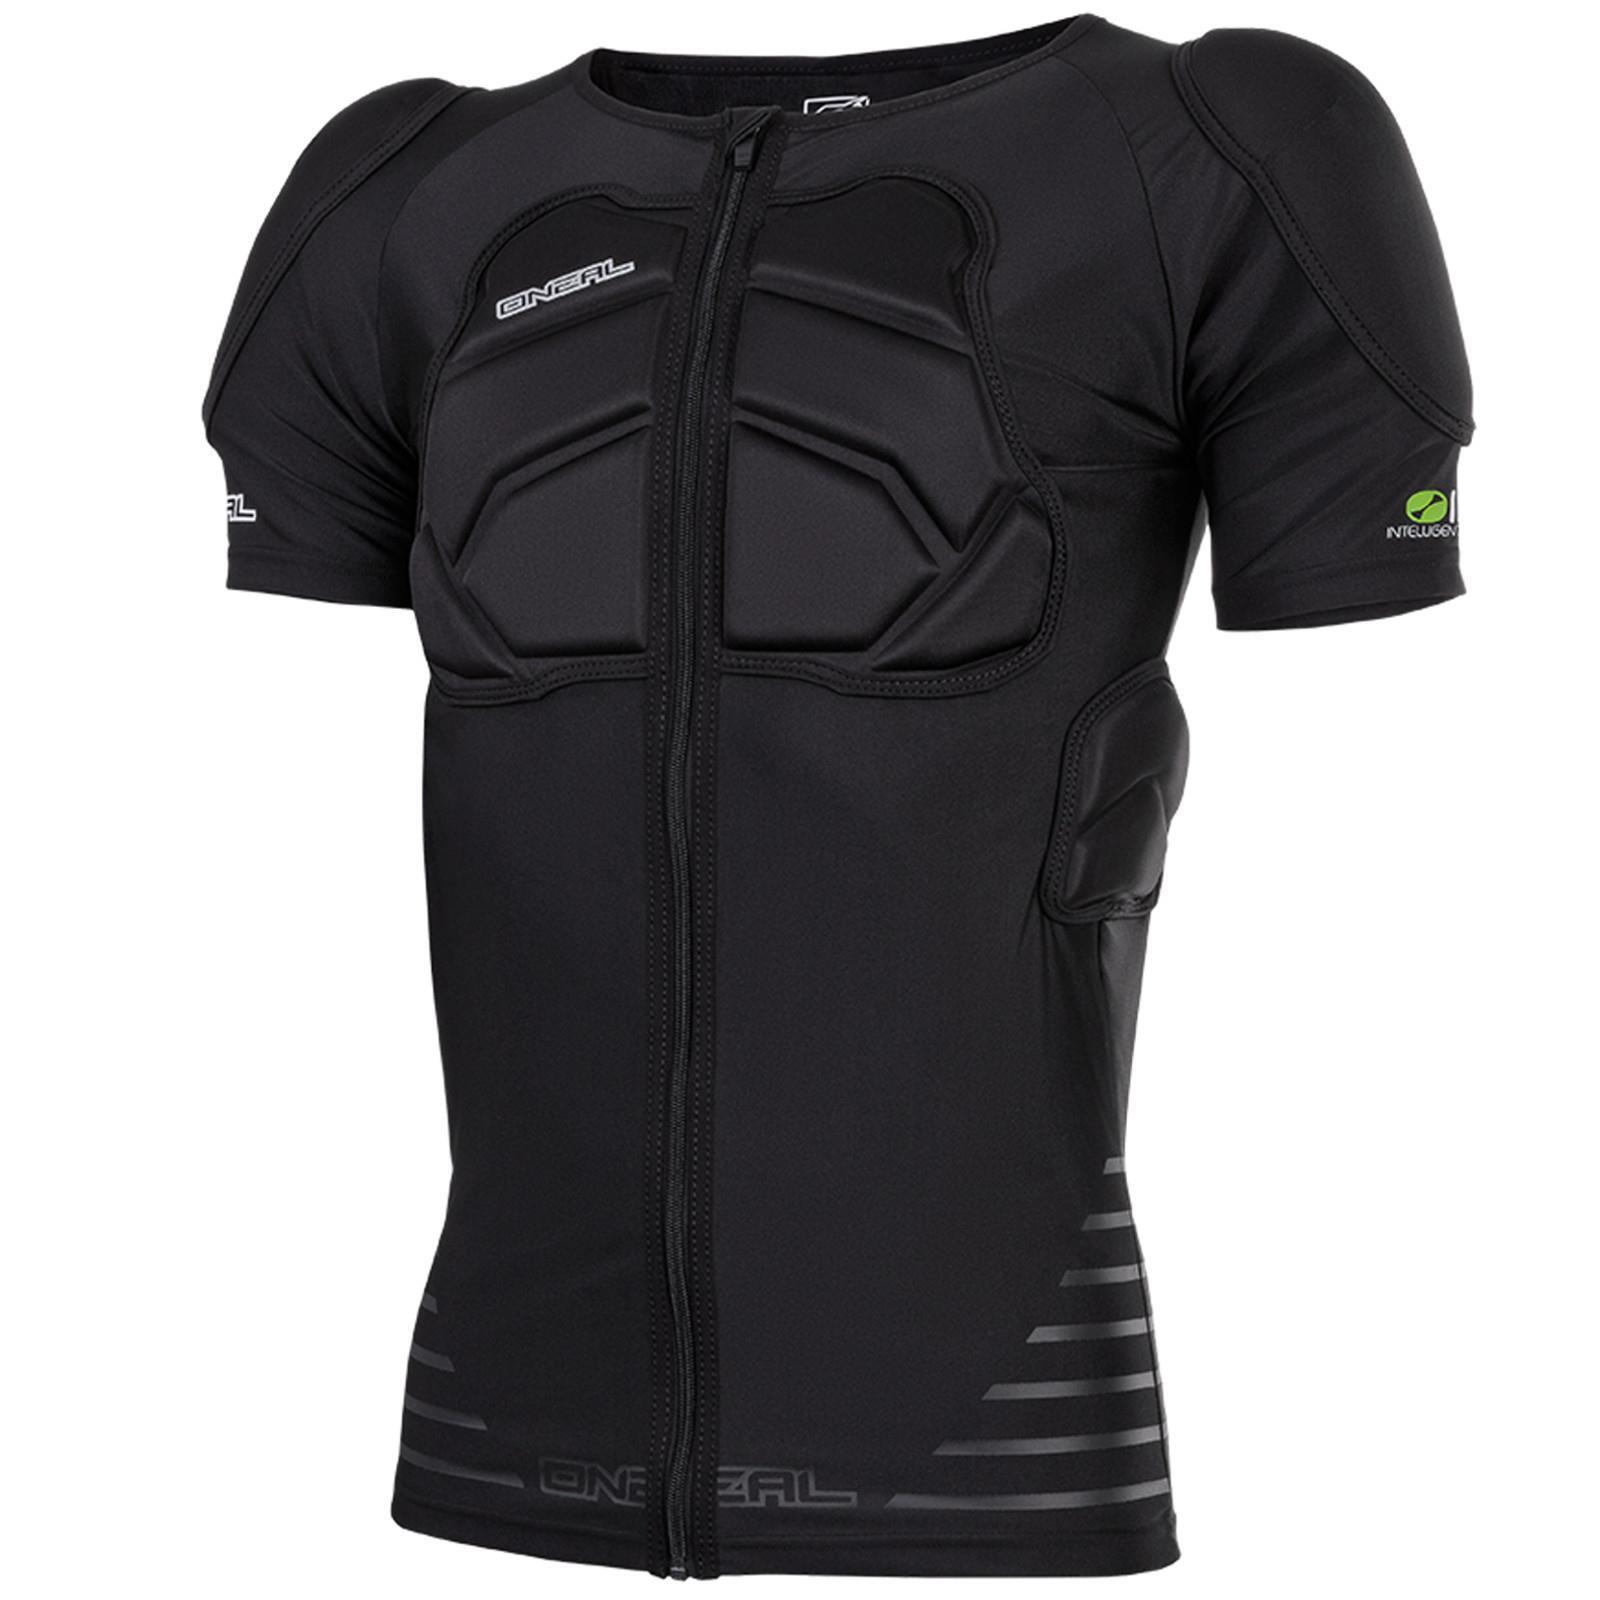 ONEAL STV Protecteur Chemise Shirt Manches Courtes Moto Cross DH MTB MX Mountain Bike Veste